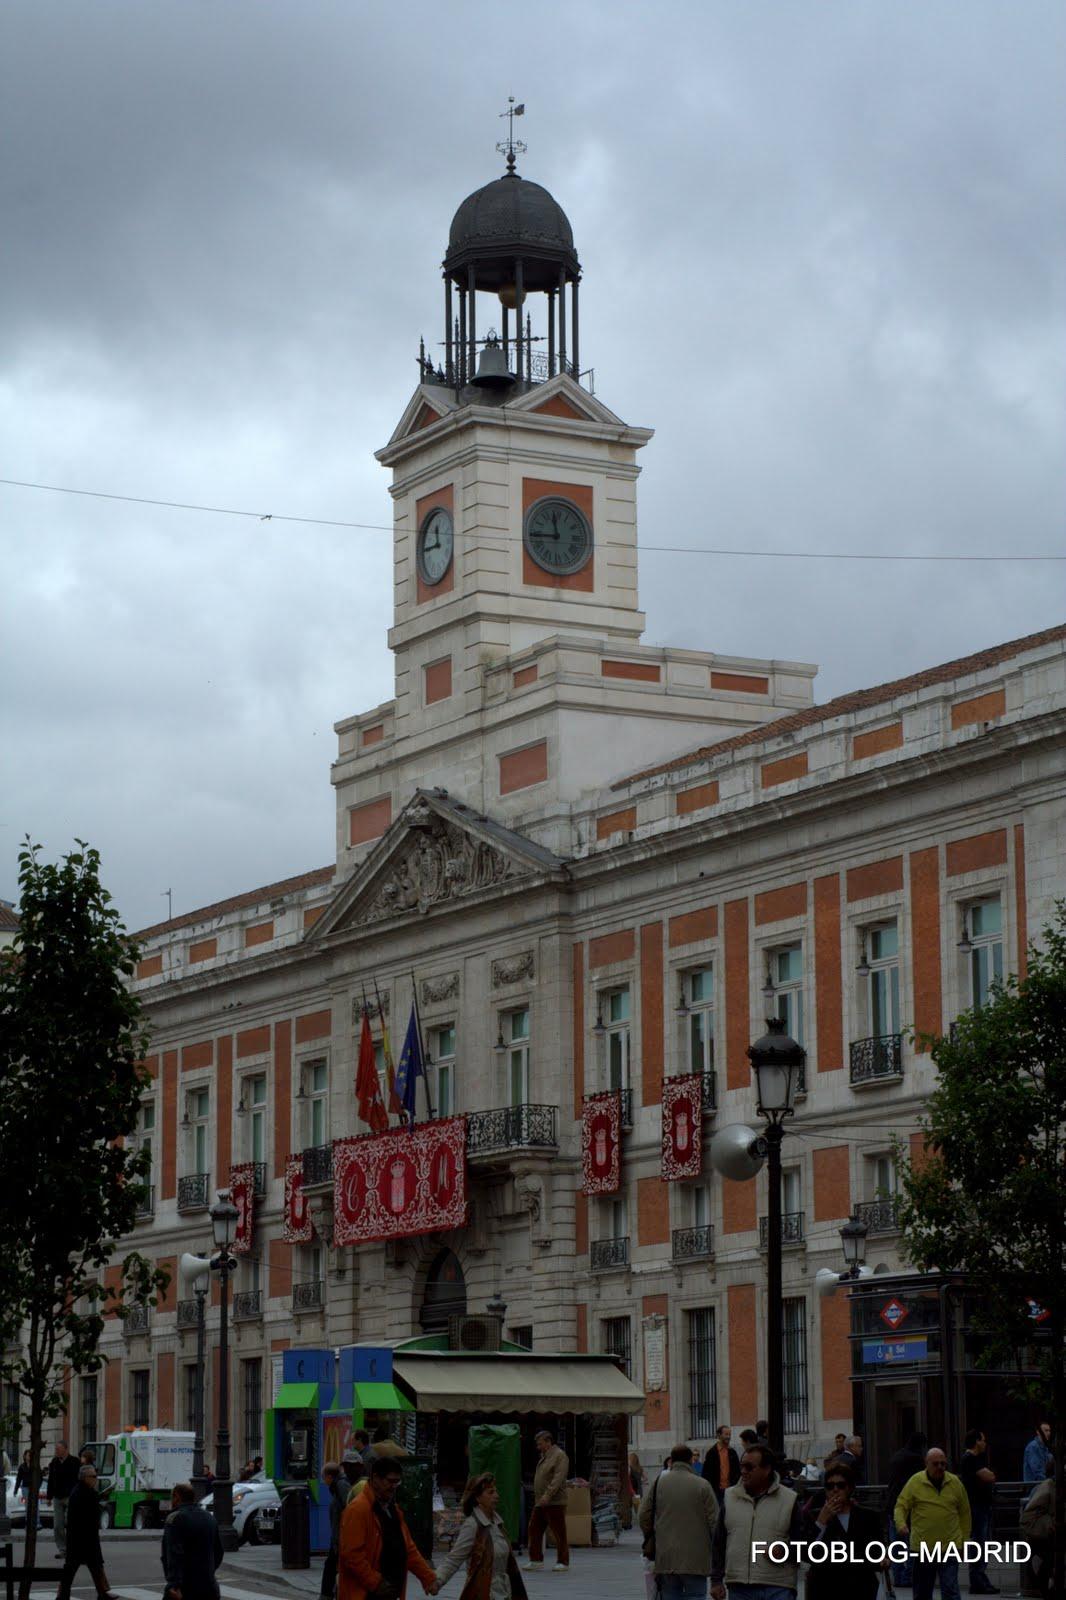 Fotoblog madrid el reloj impuntual for Reloj puerta del sol madrid